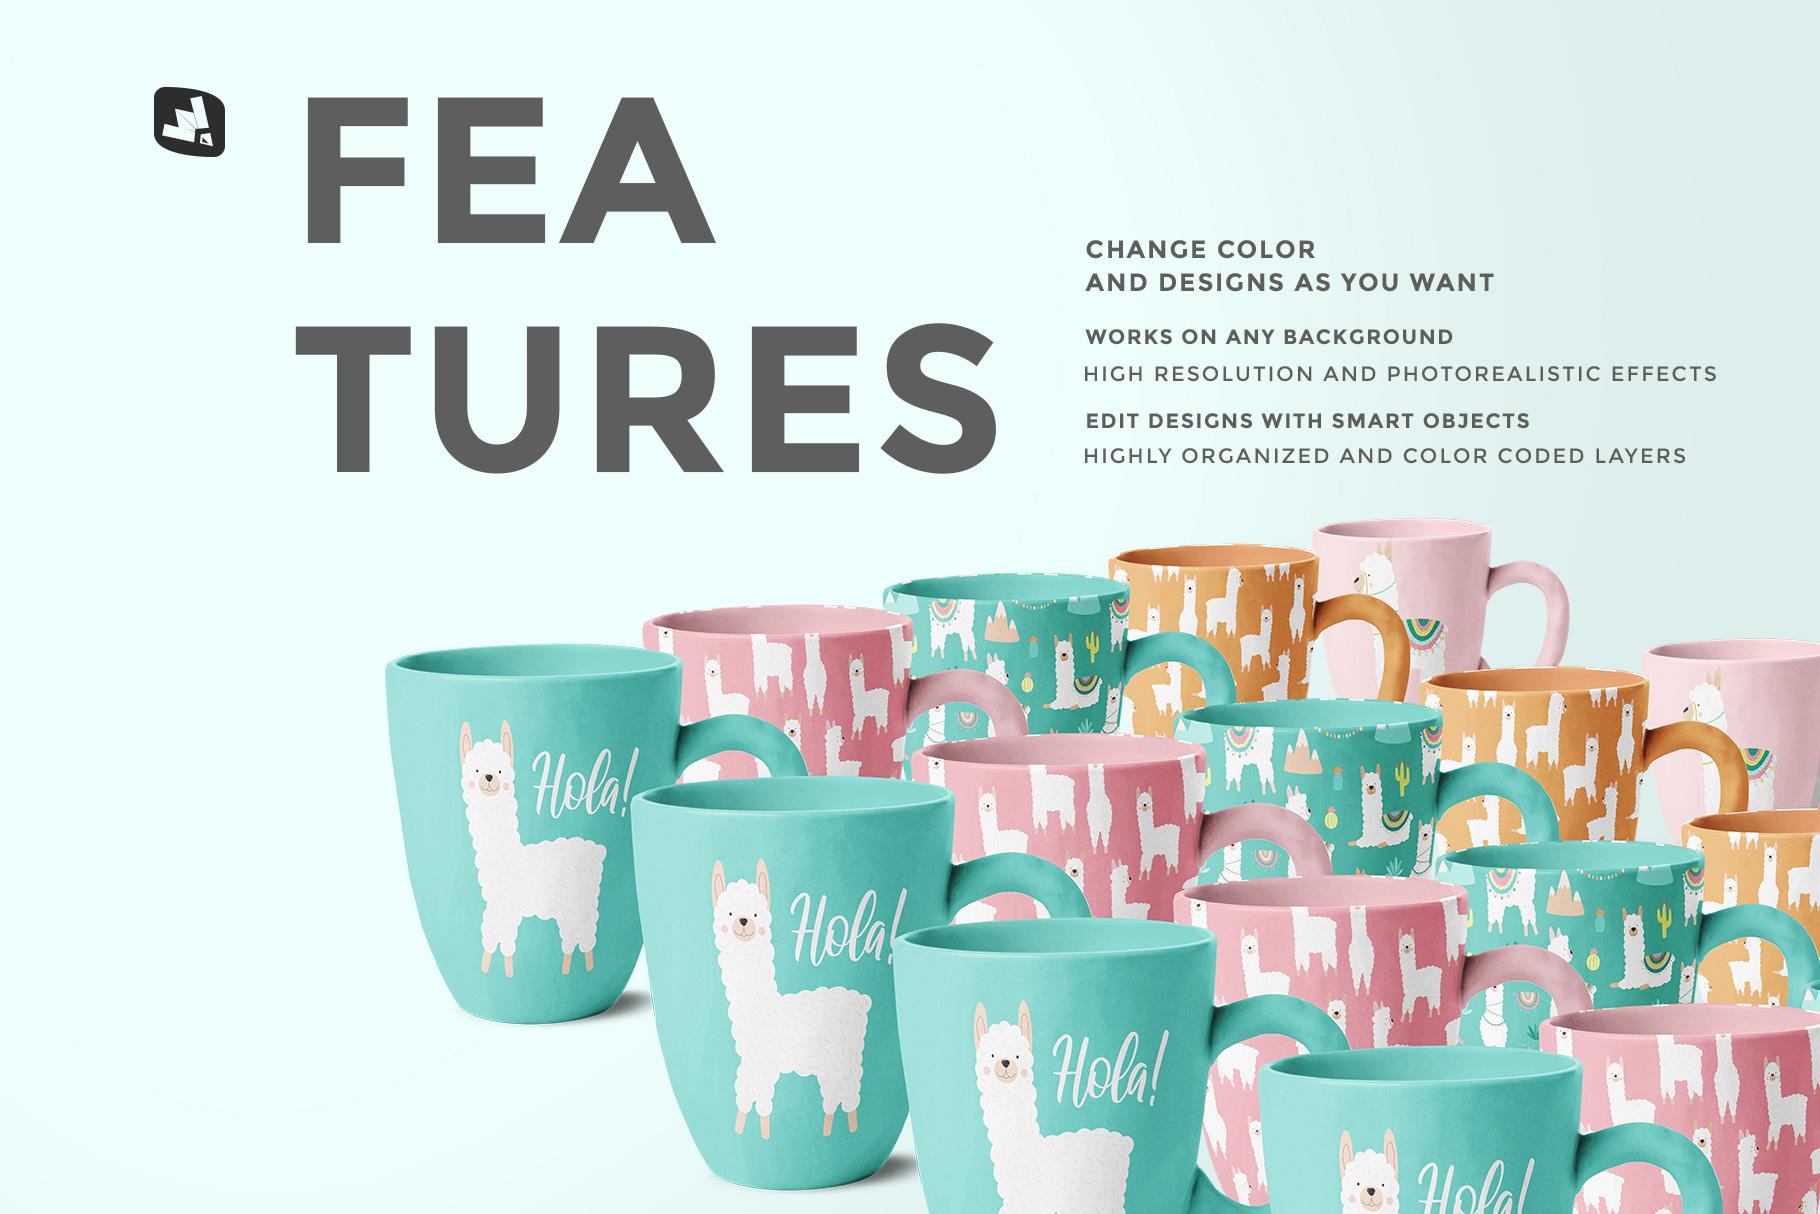 features of the ceramic mug set mockup